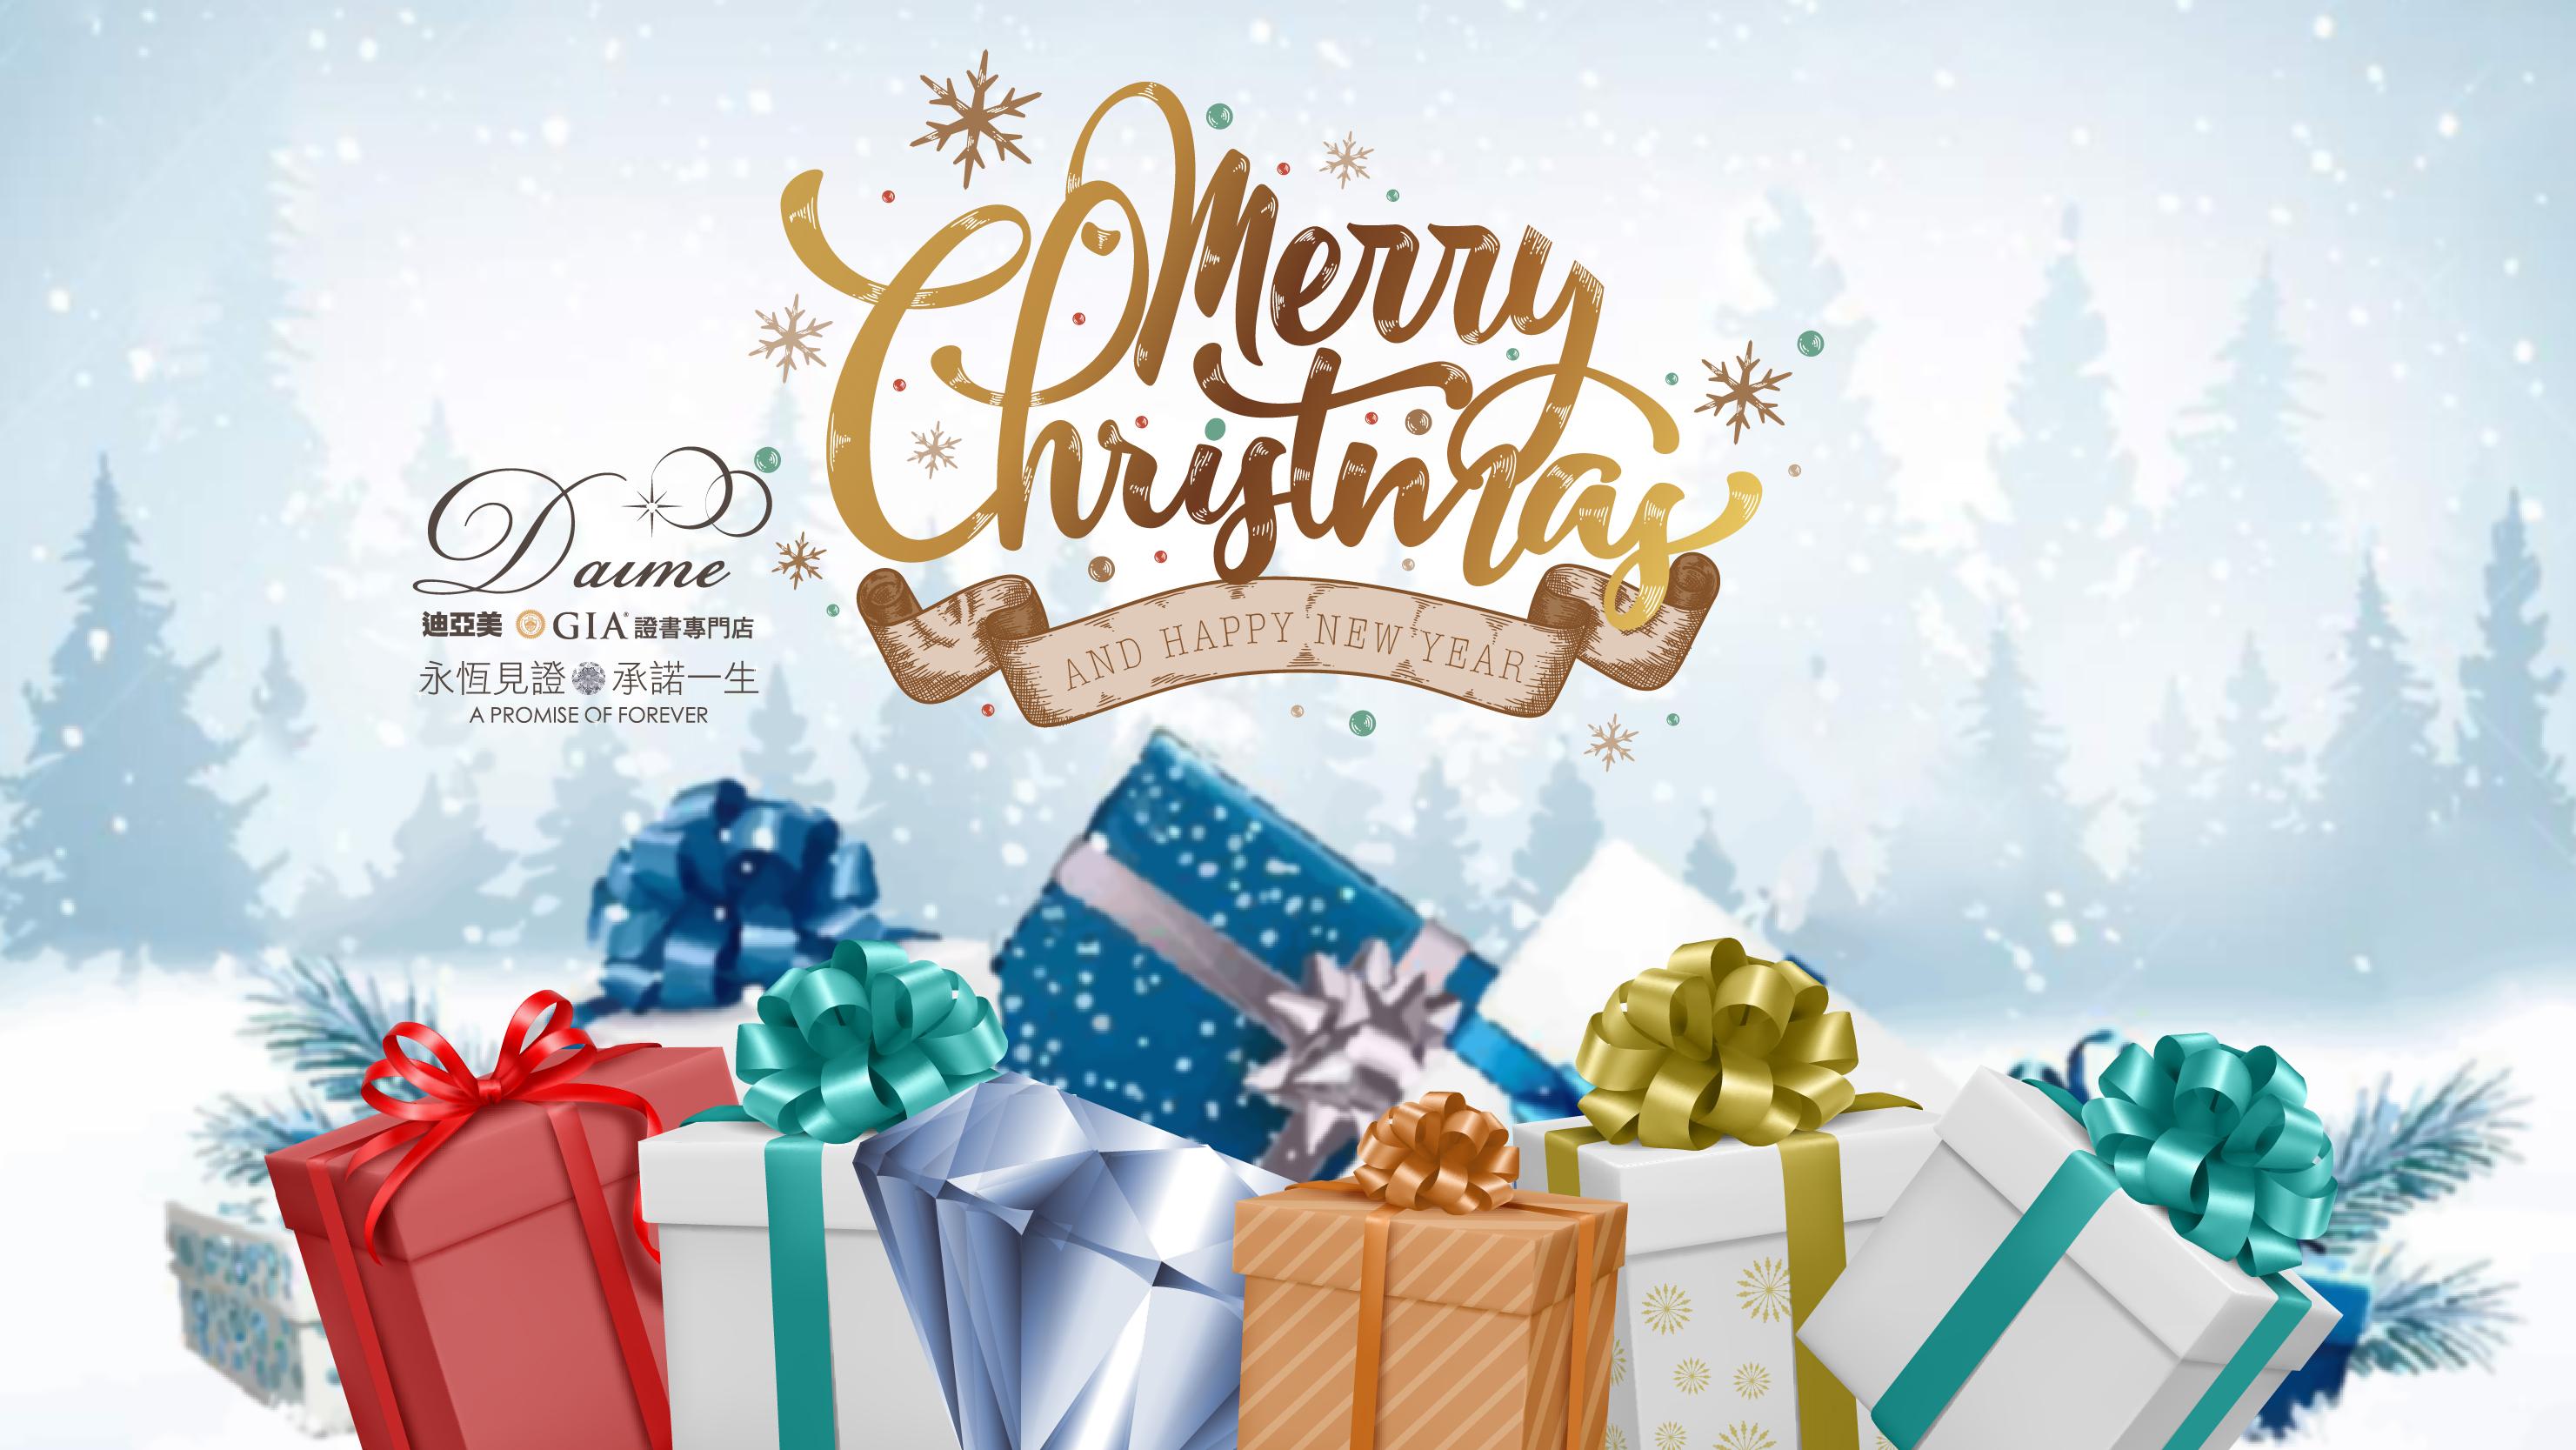 04_12_2019edm_Christmas_mainbanner_A2-01